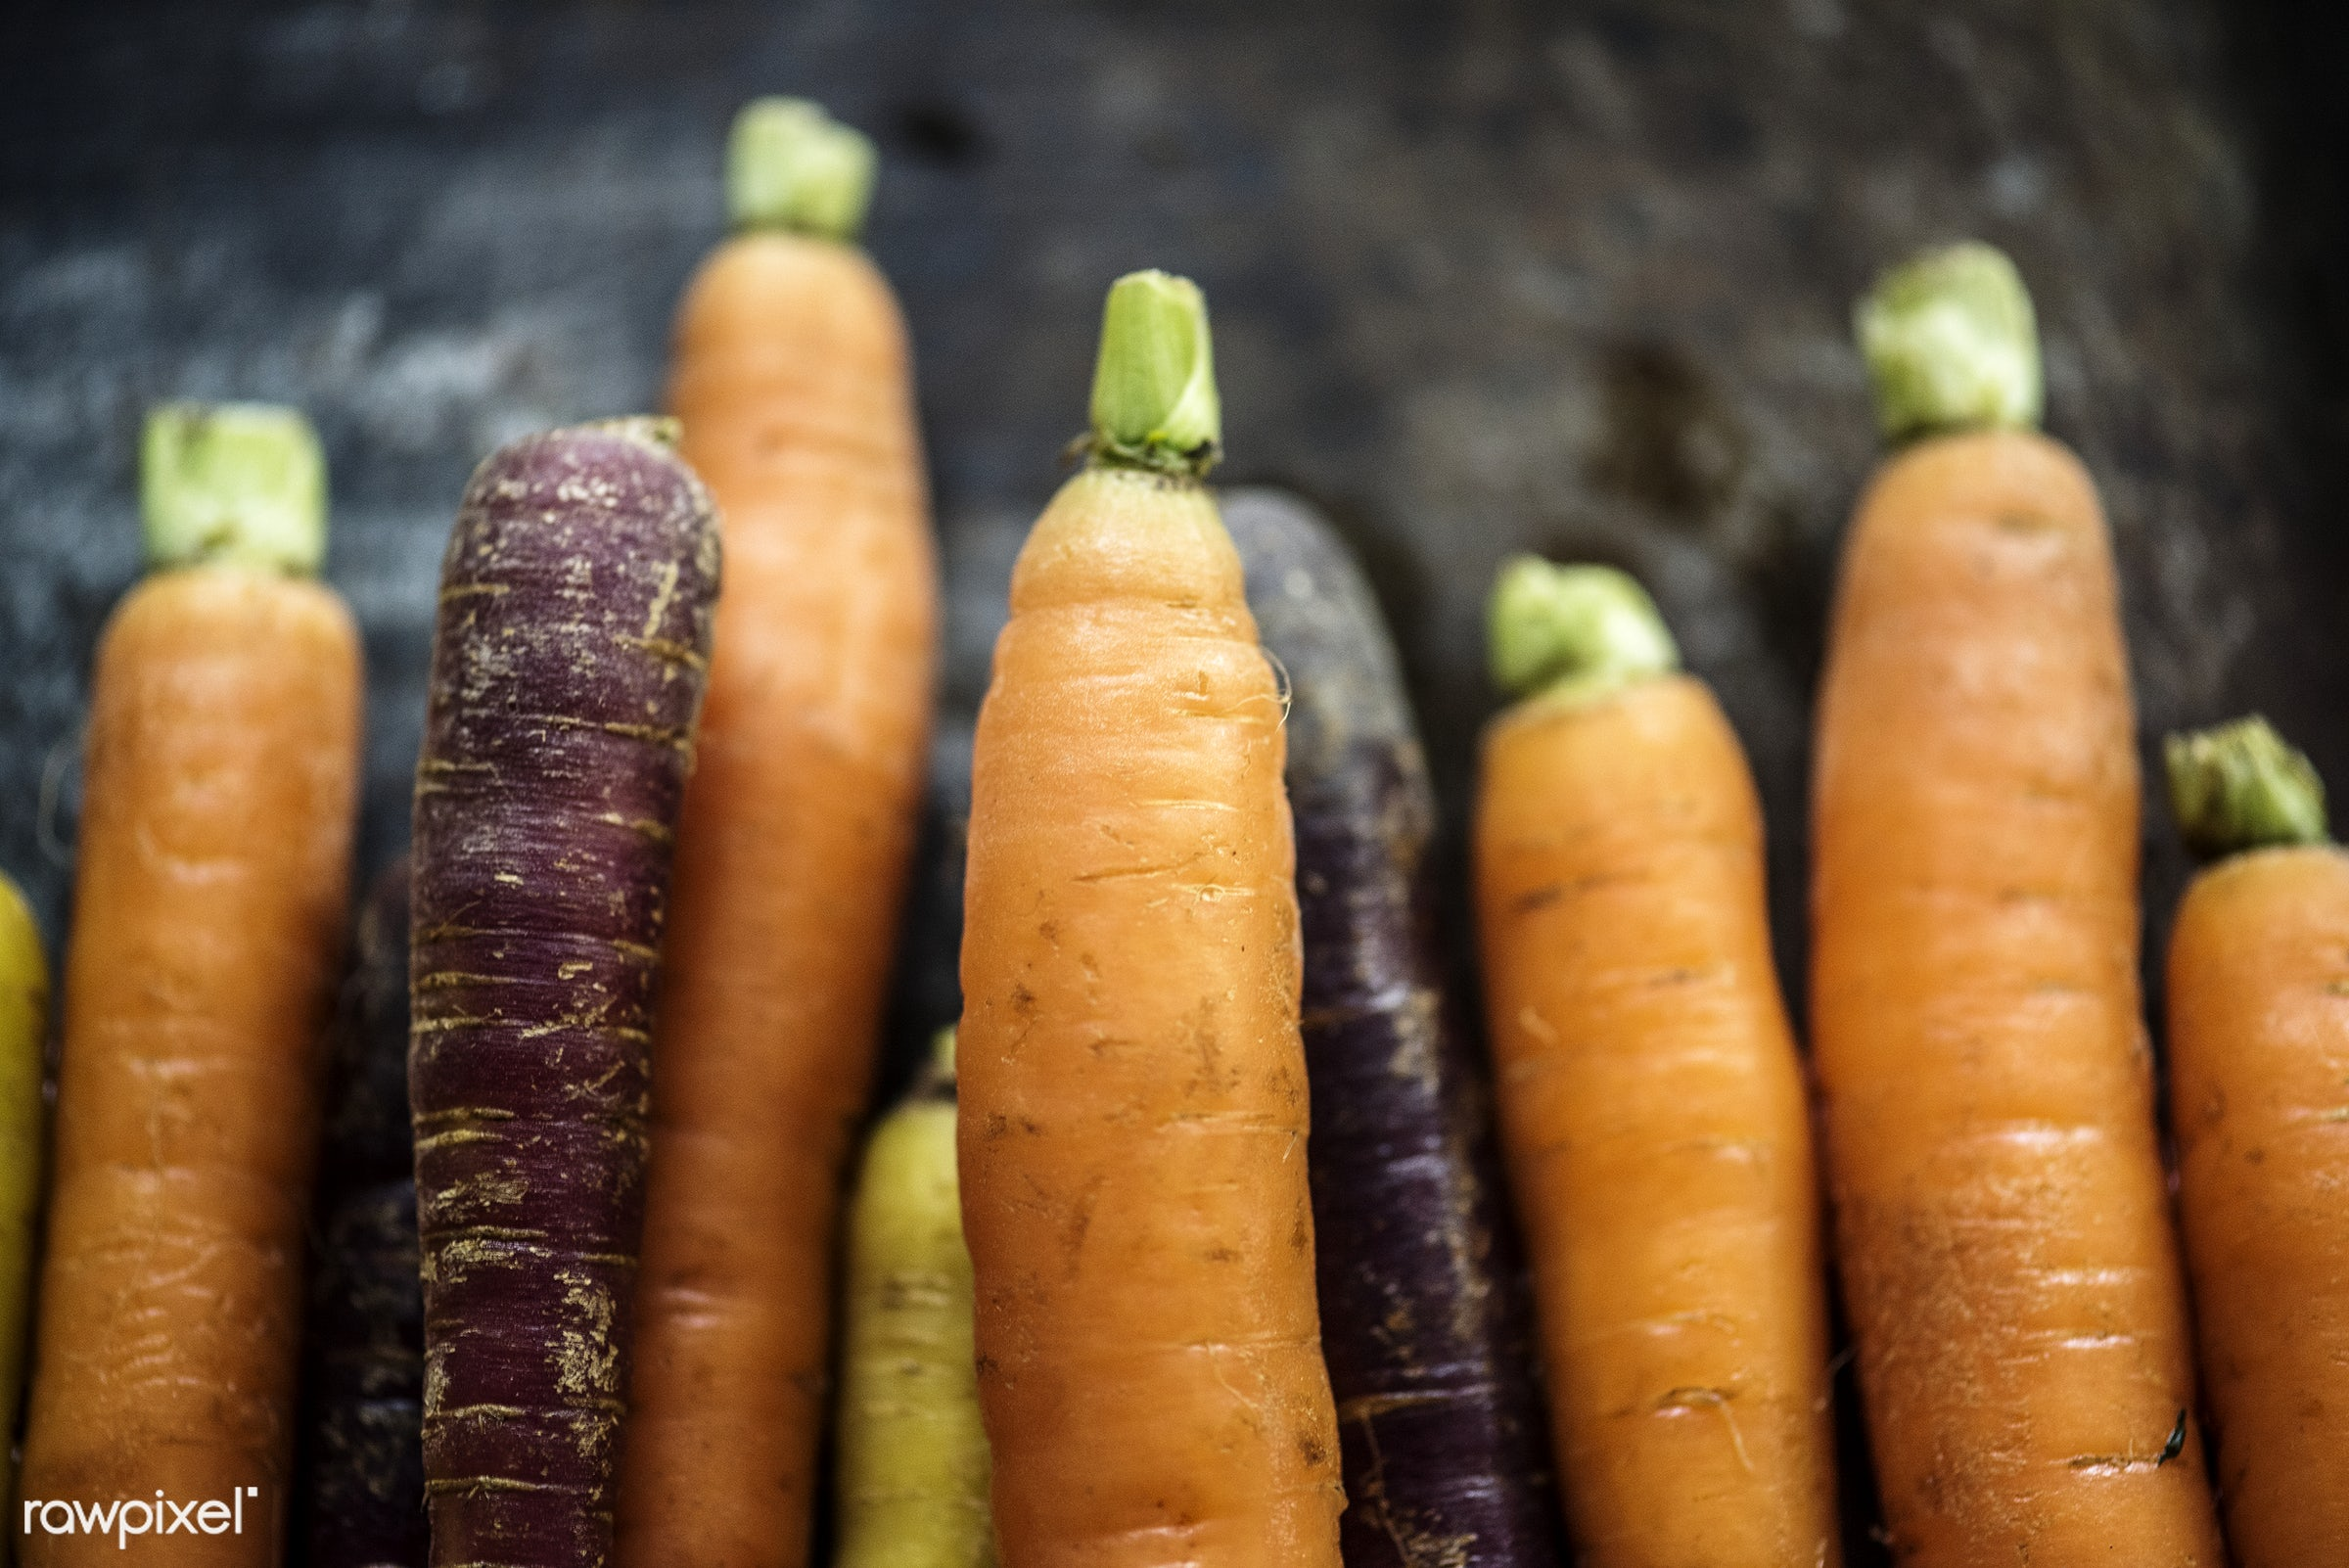 Fresh organic carrots - nutrients, real, organic, fresh, mixed, carrots, various, bunch, types, vegetable, closeup